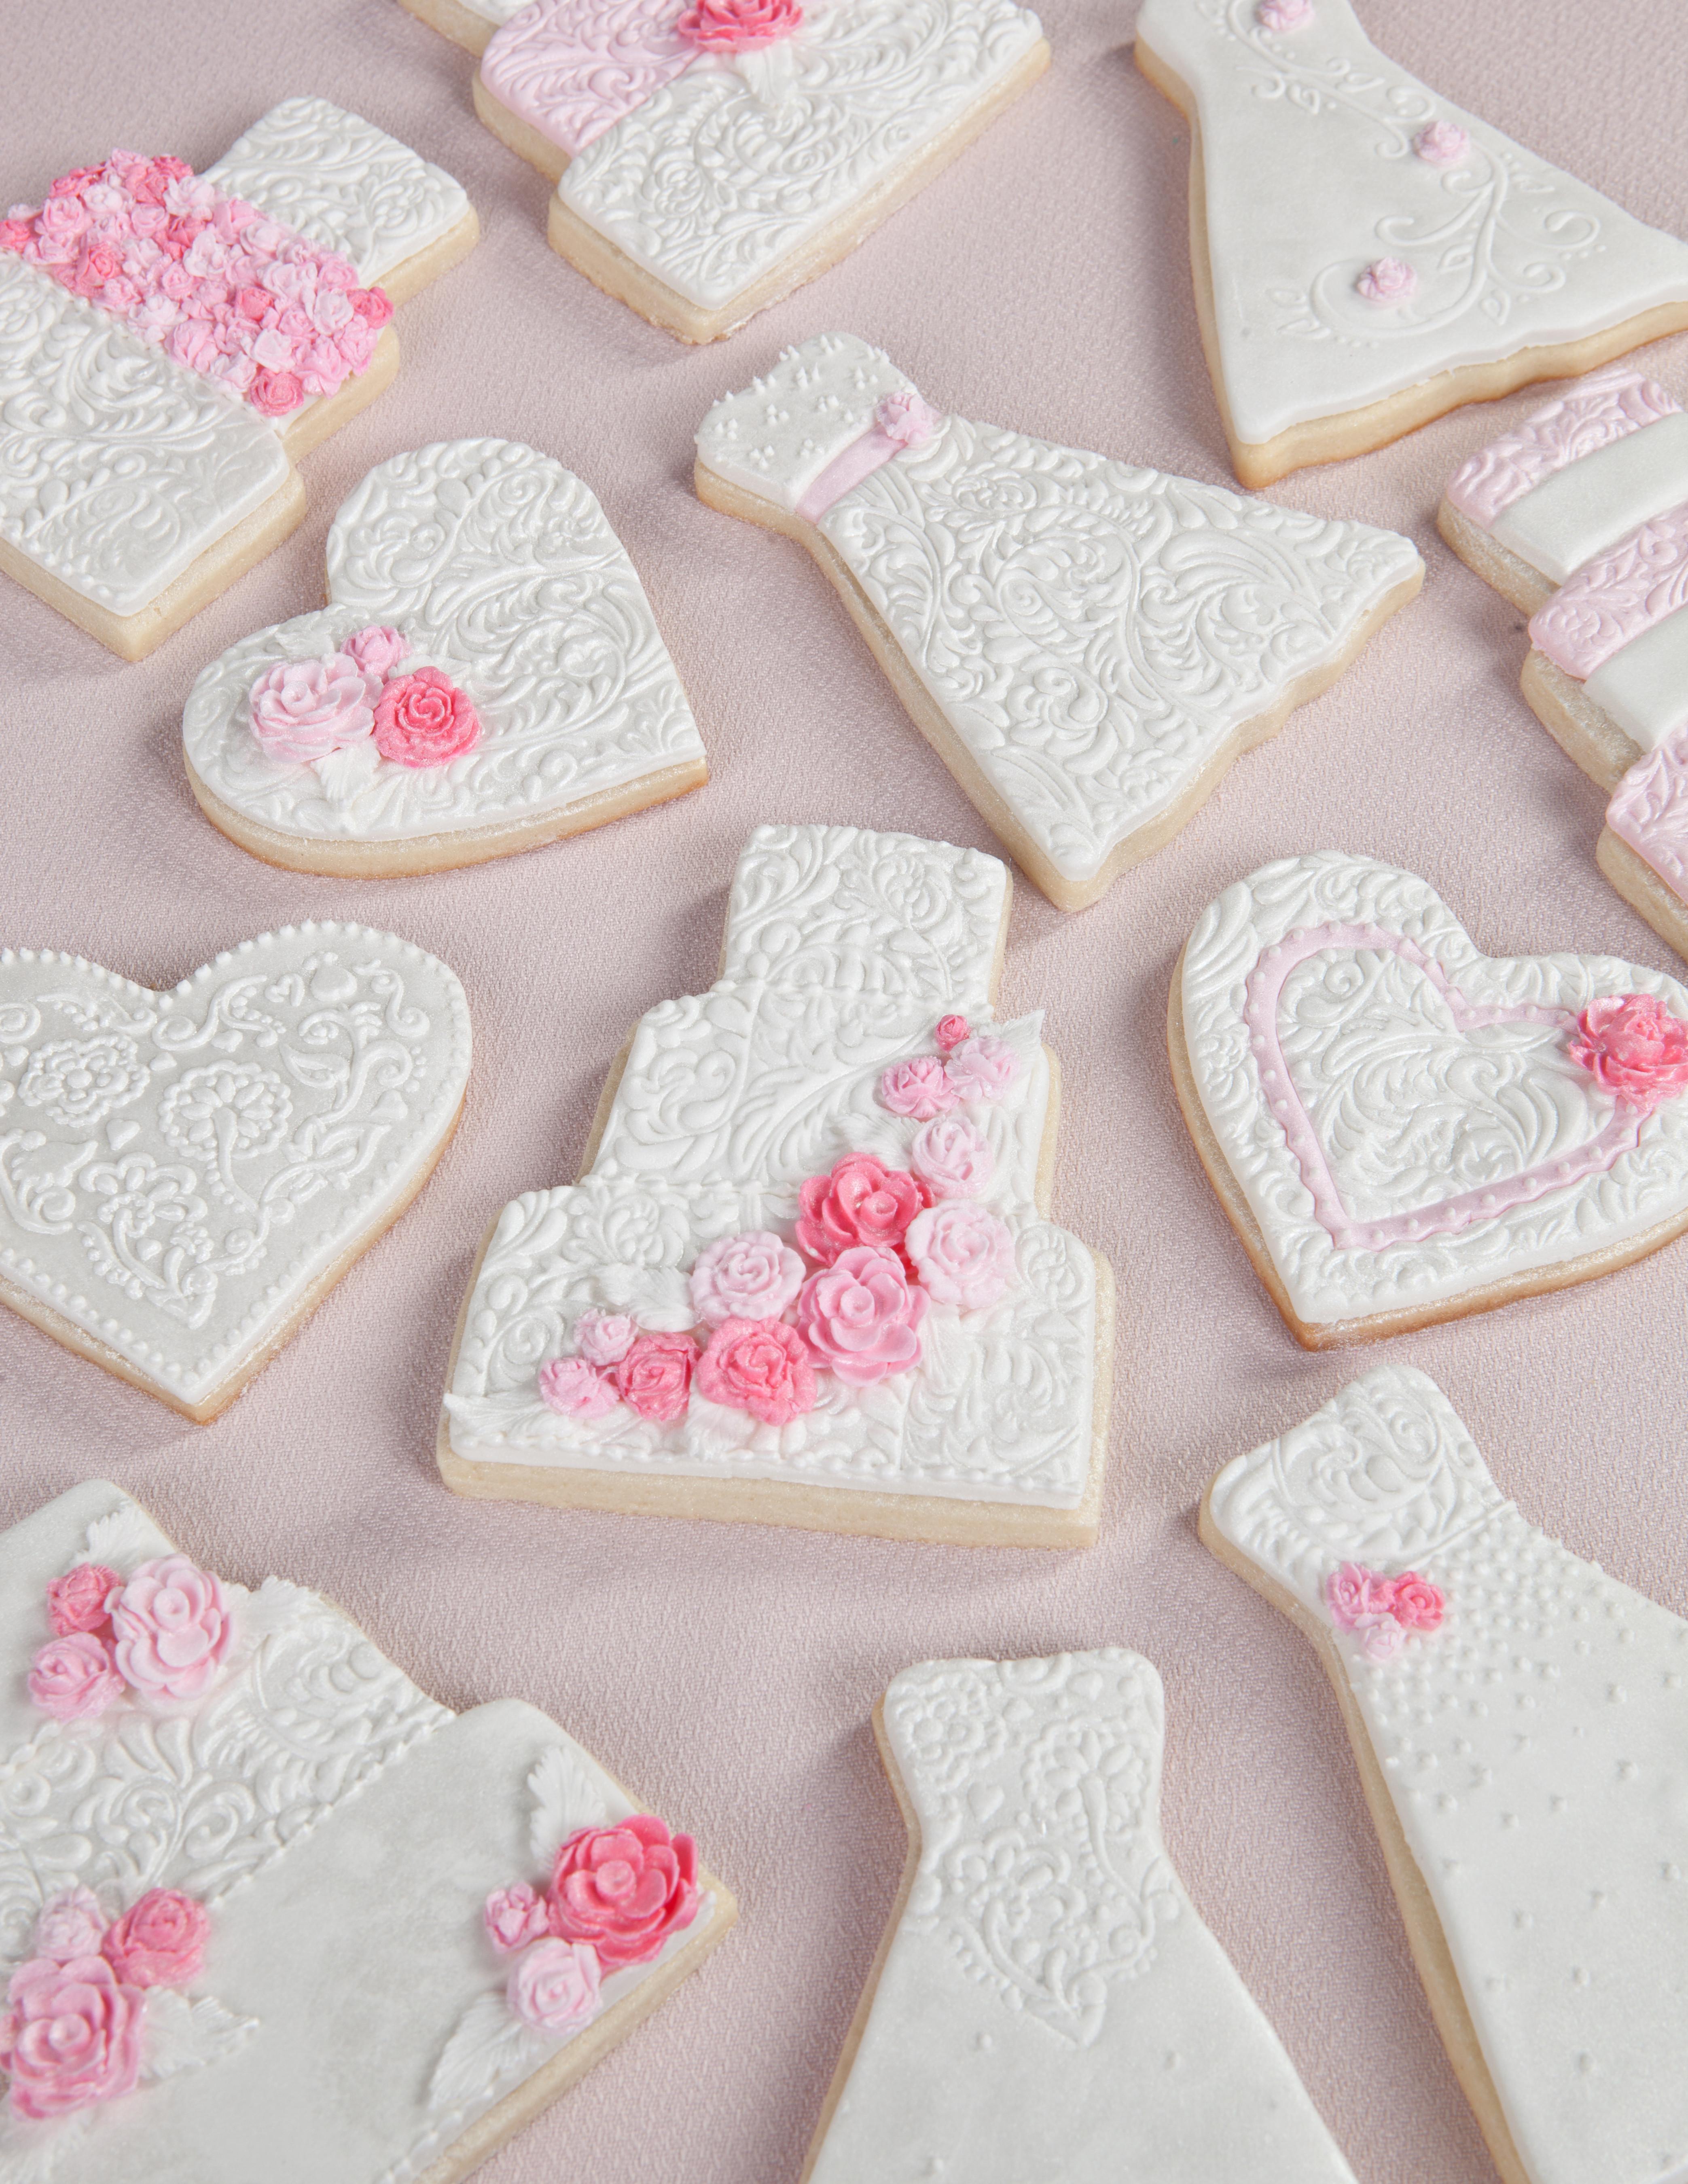 Wedding Sugar Cookies Decorating Ideas  Wedding Bridal Shower Cookies